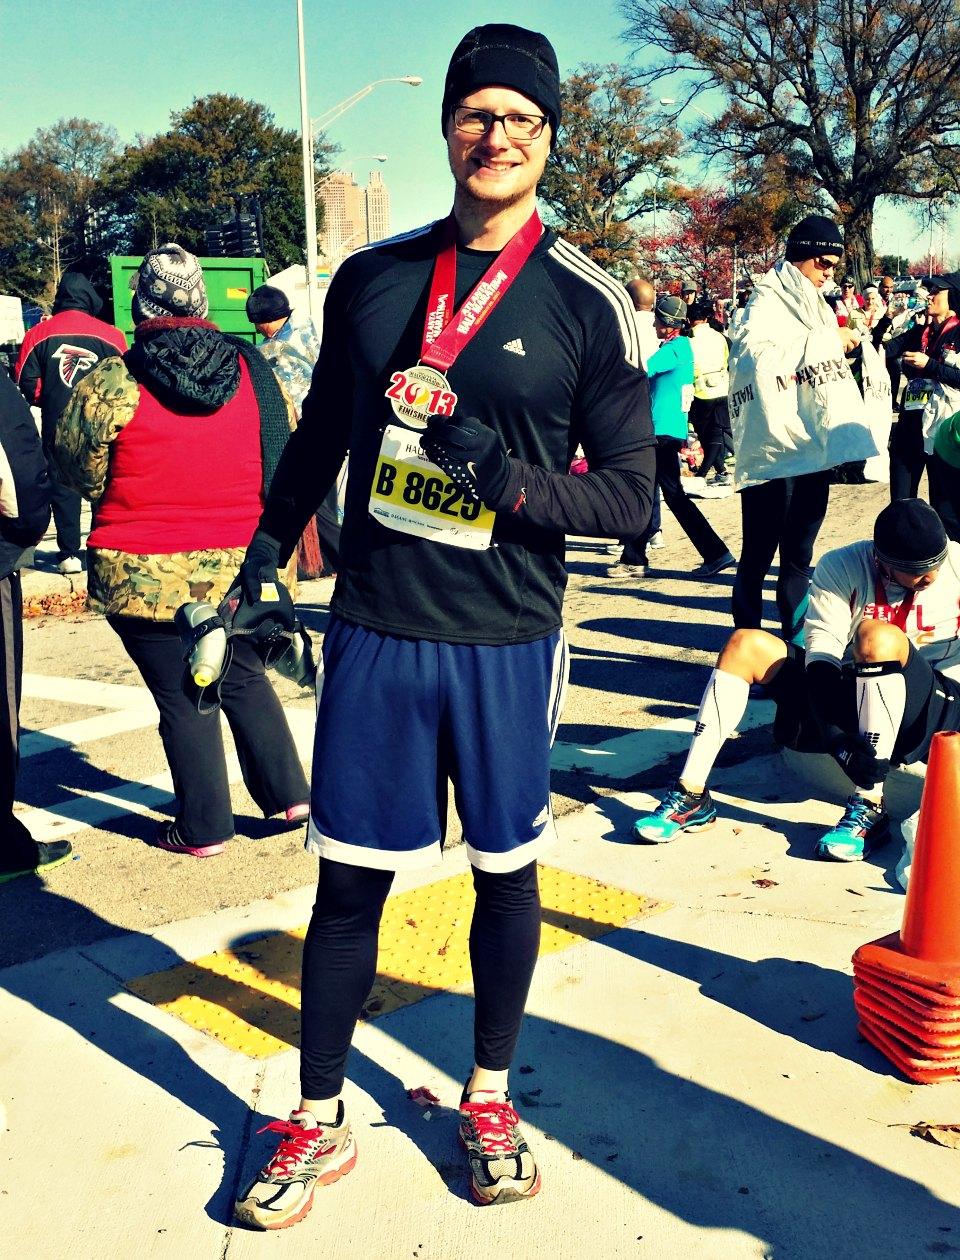 Mikey Marathon